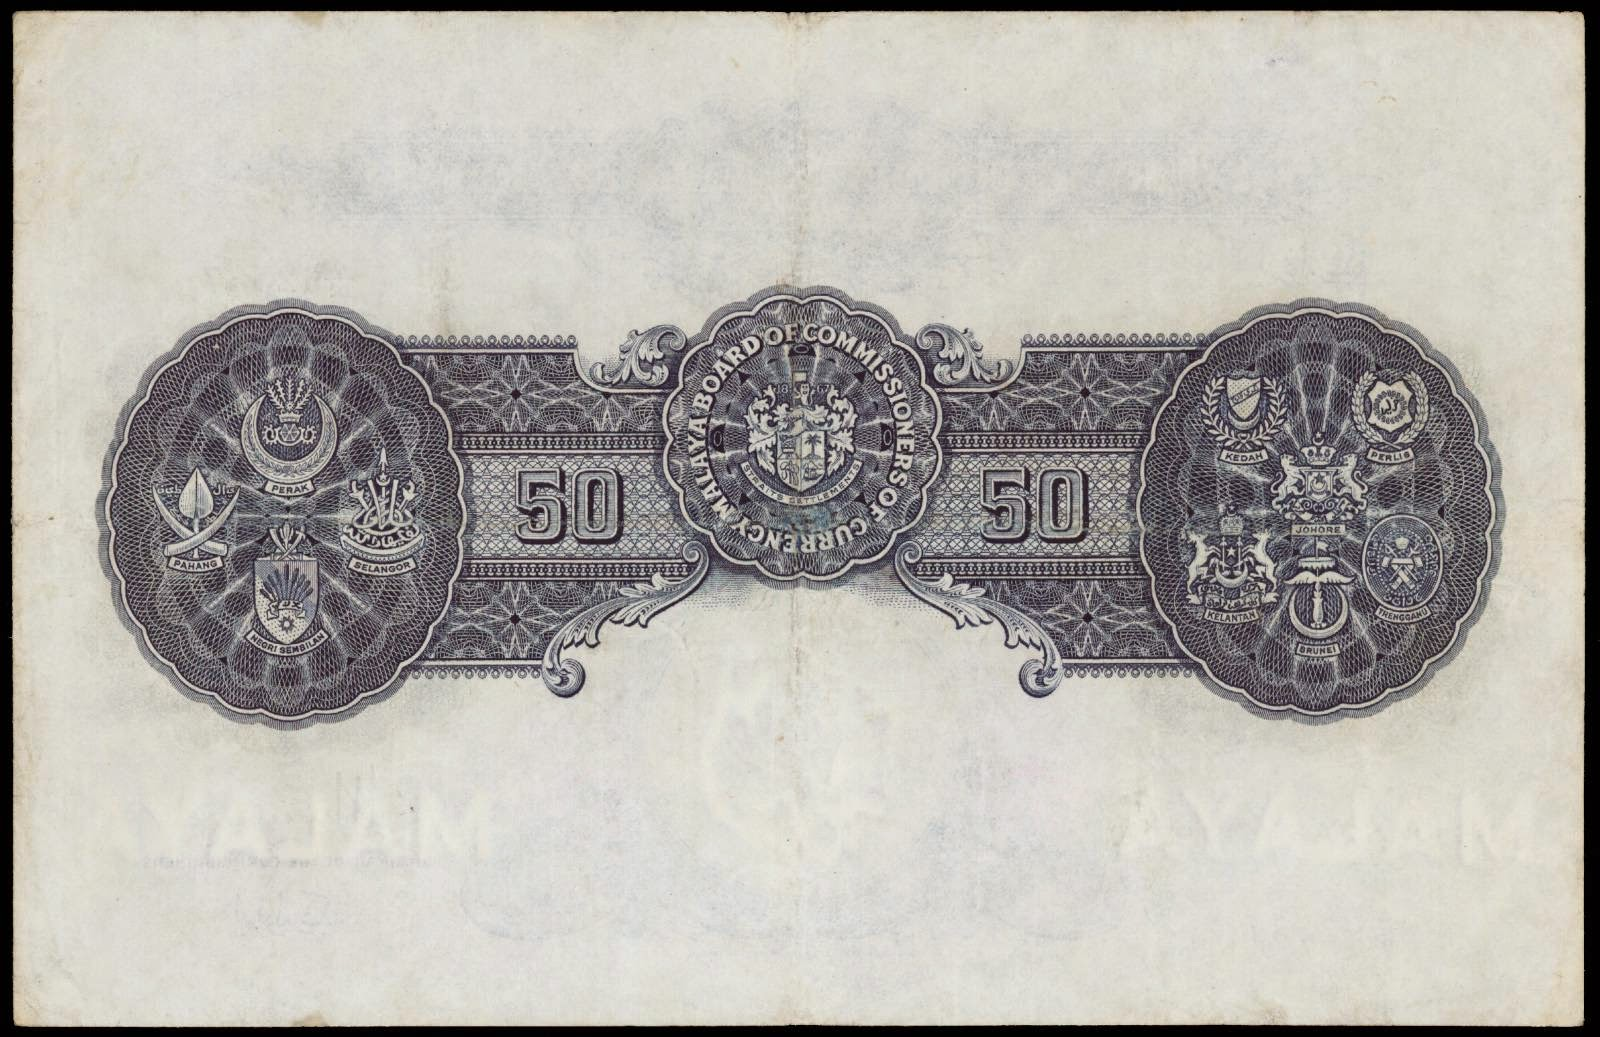 Malaya 50 Dollar bill note